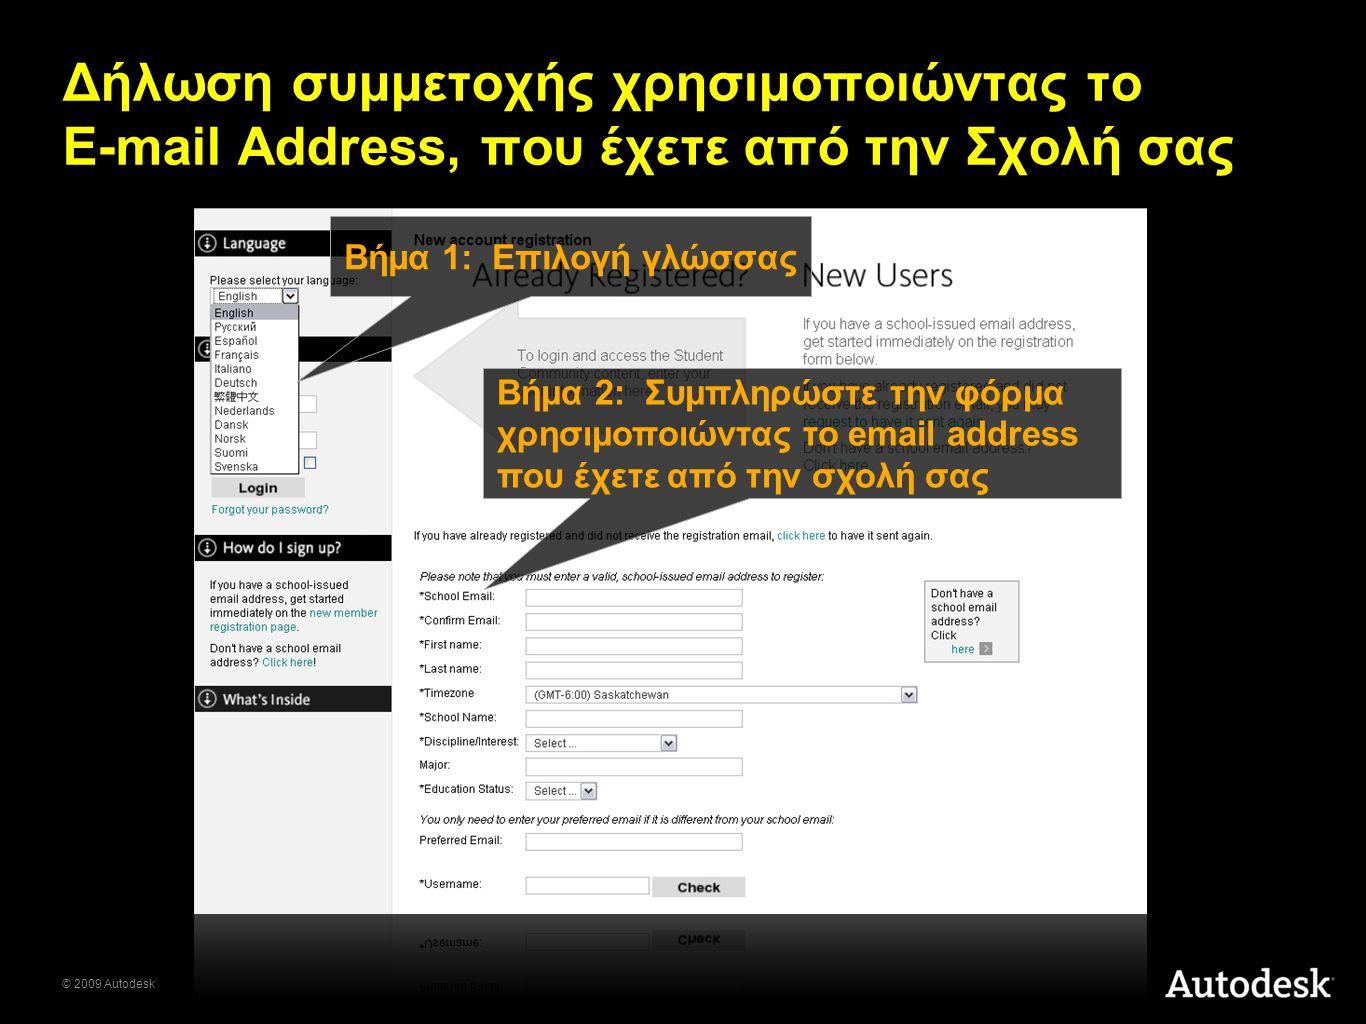 © 2009 Autodesk Βήμα 1: Επιλογή γλώσσας Βήμα 2: Συμπληρώστε την φόρμα χρησιμοποιώντας το email address που έχετε από την σχολή σας Δήλωση συμμετοχής χρησιμοποιώντας το E-mail Address, που έχετε από την Σχολή σας